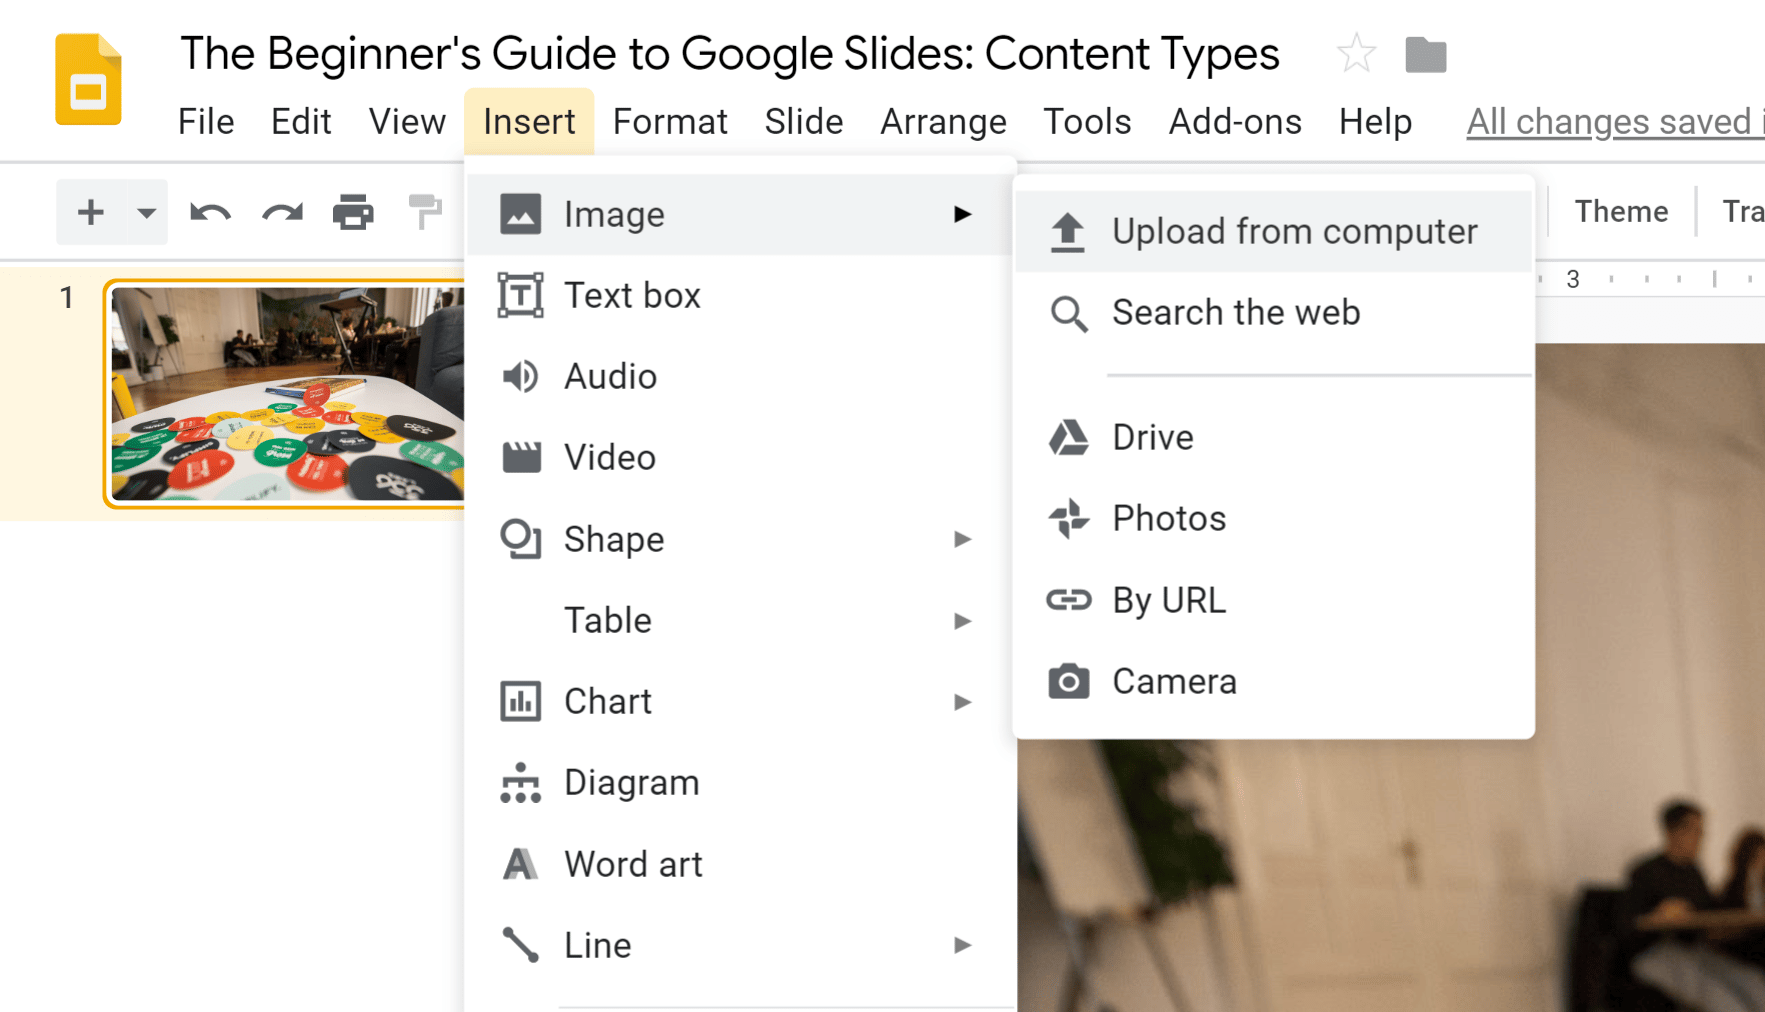 Google Slides Content Types - Images